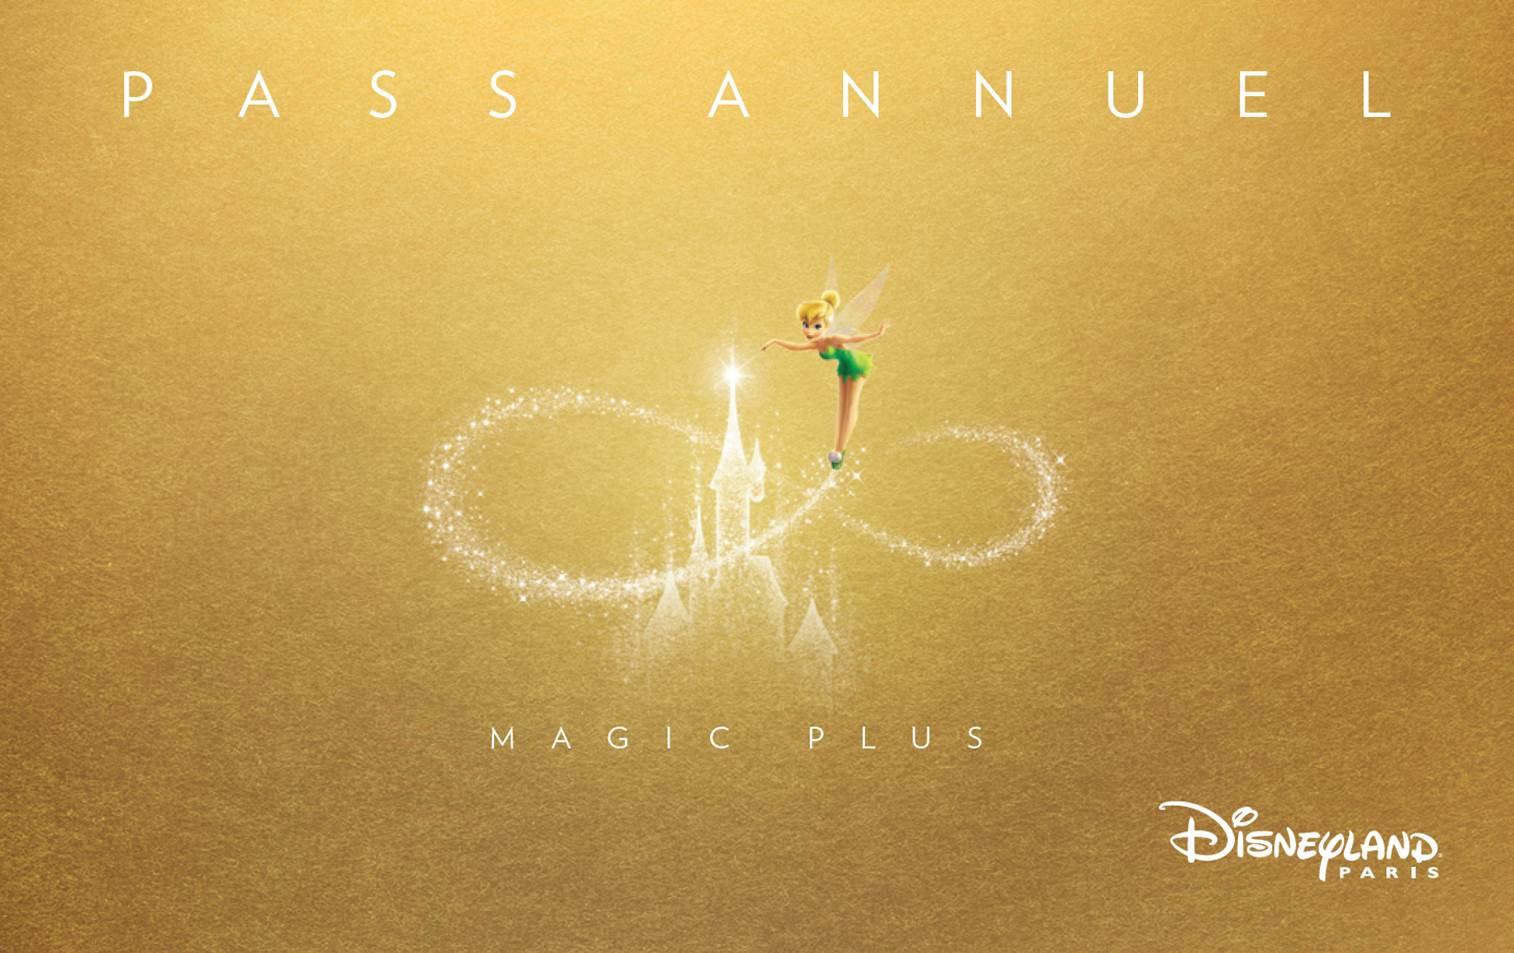 Passeport annuel Disney